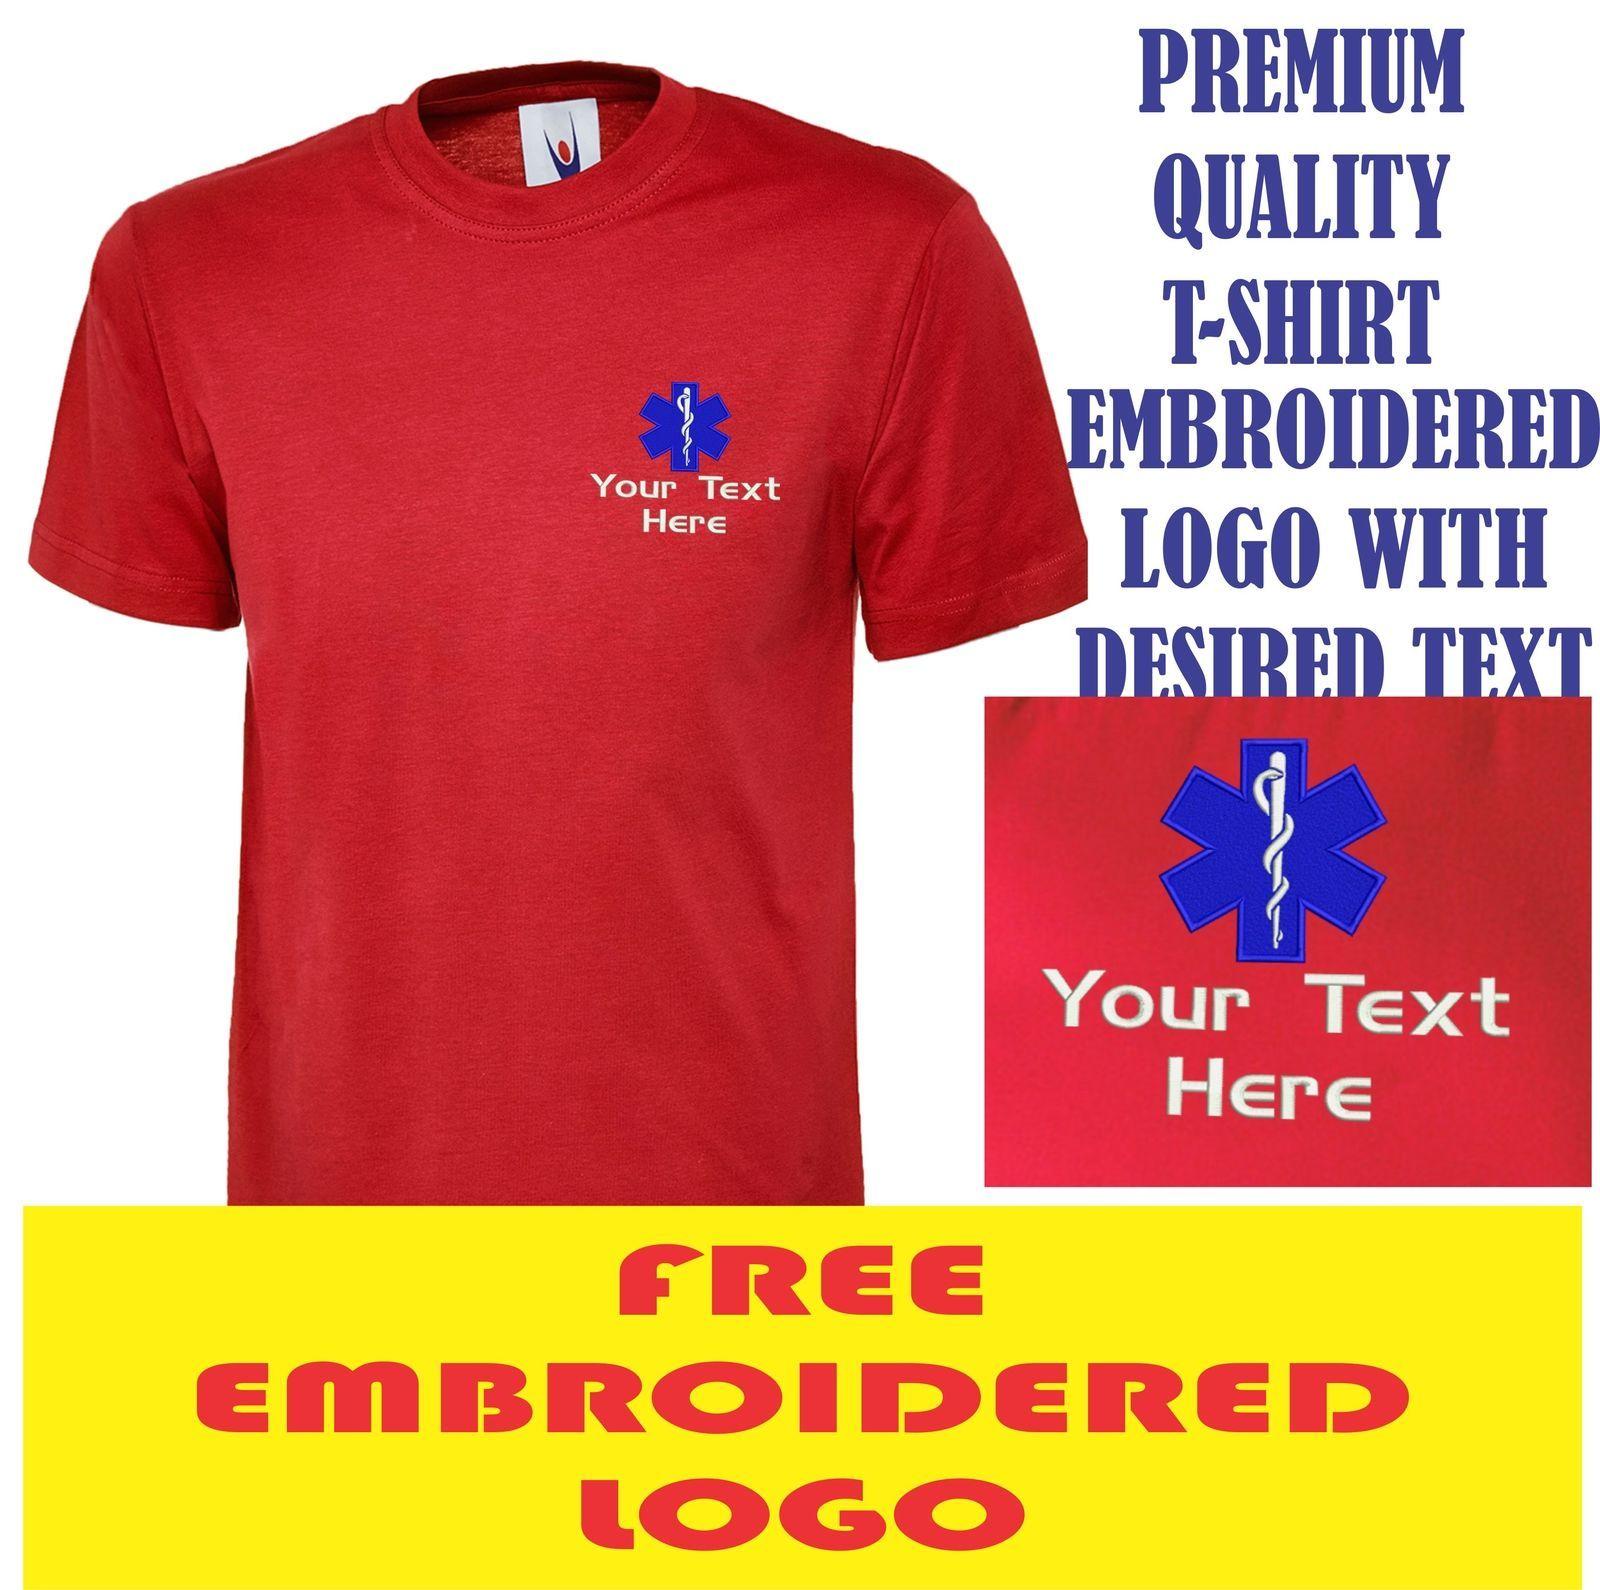 59c767d6e Compre Personalizado Estrela Da Vida Logotipo T Shirt Bordada Medical NHS  Uniforme LOGOFunny Frete Grátis Unisex Presente Tee Casual De  Teetreedesigns